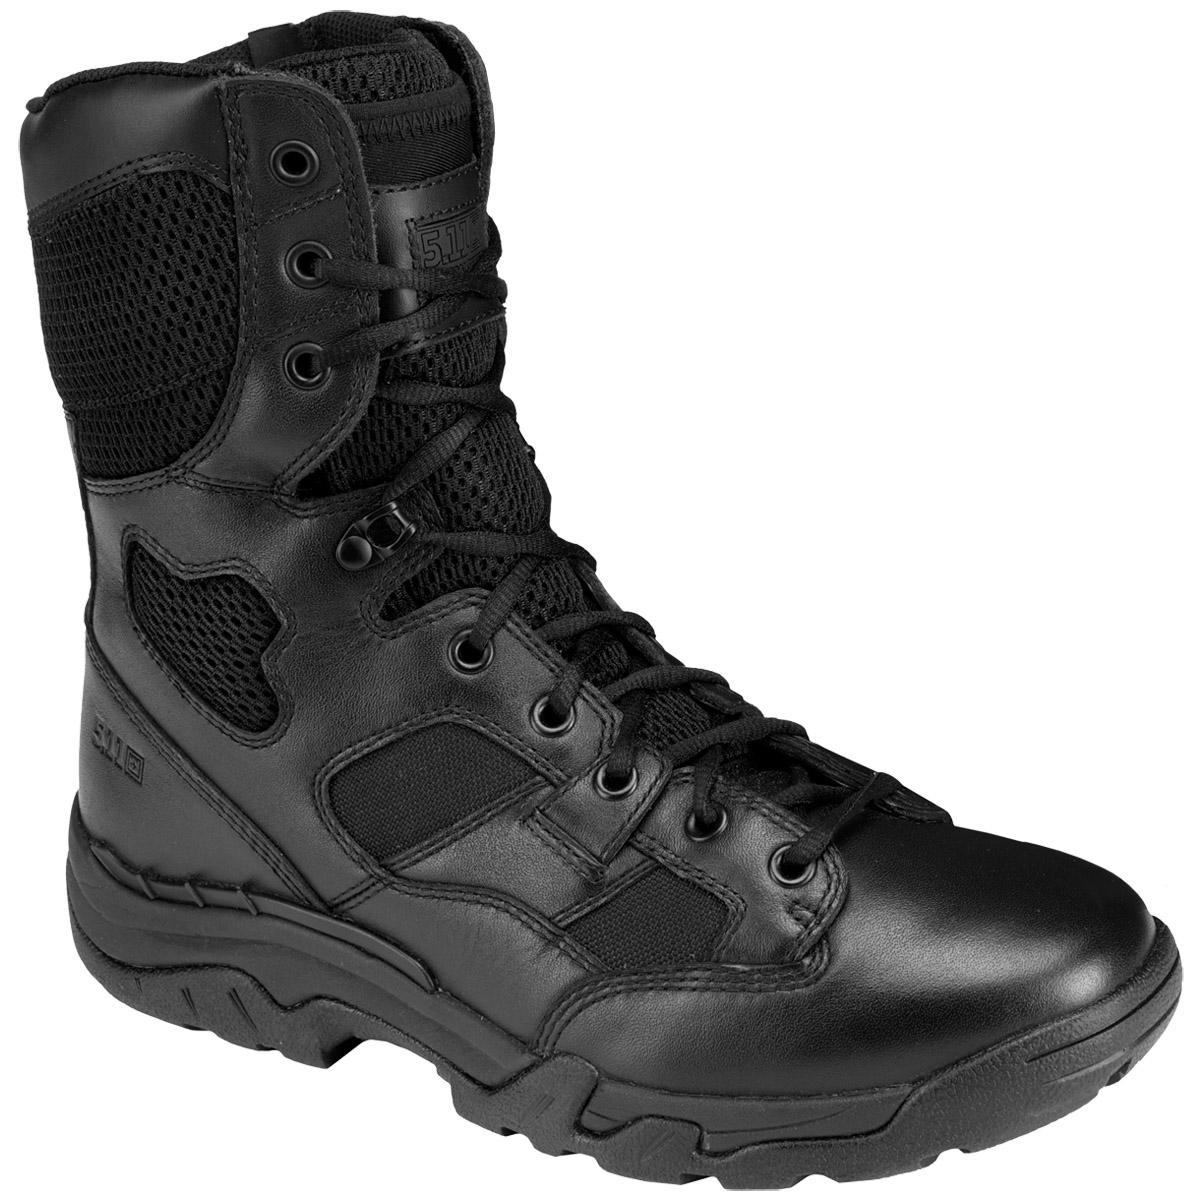 5 11 Taclite 8 Quot Side Zip Mens Tactical Patrol Boots Police